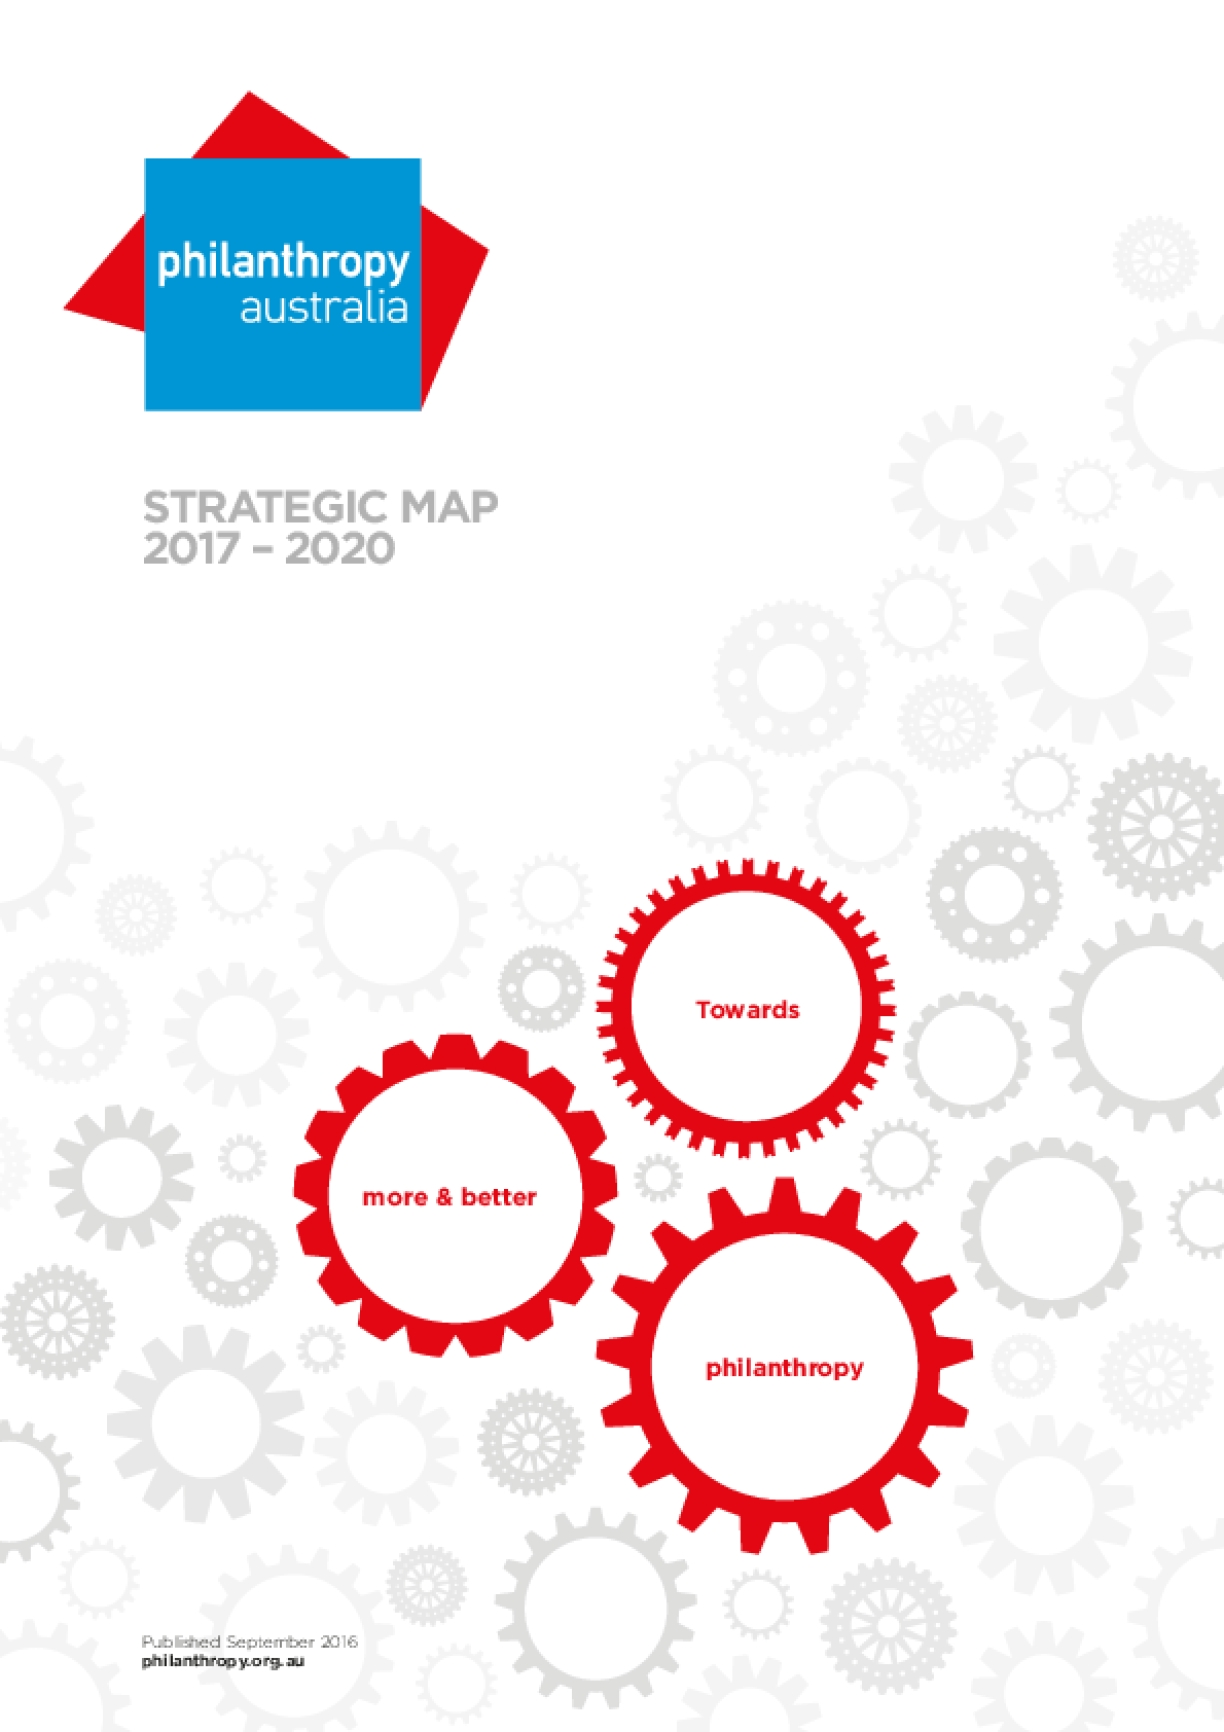 Philanthropy Australia Strategic Map 2017-2020